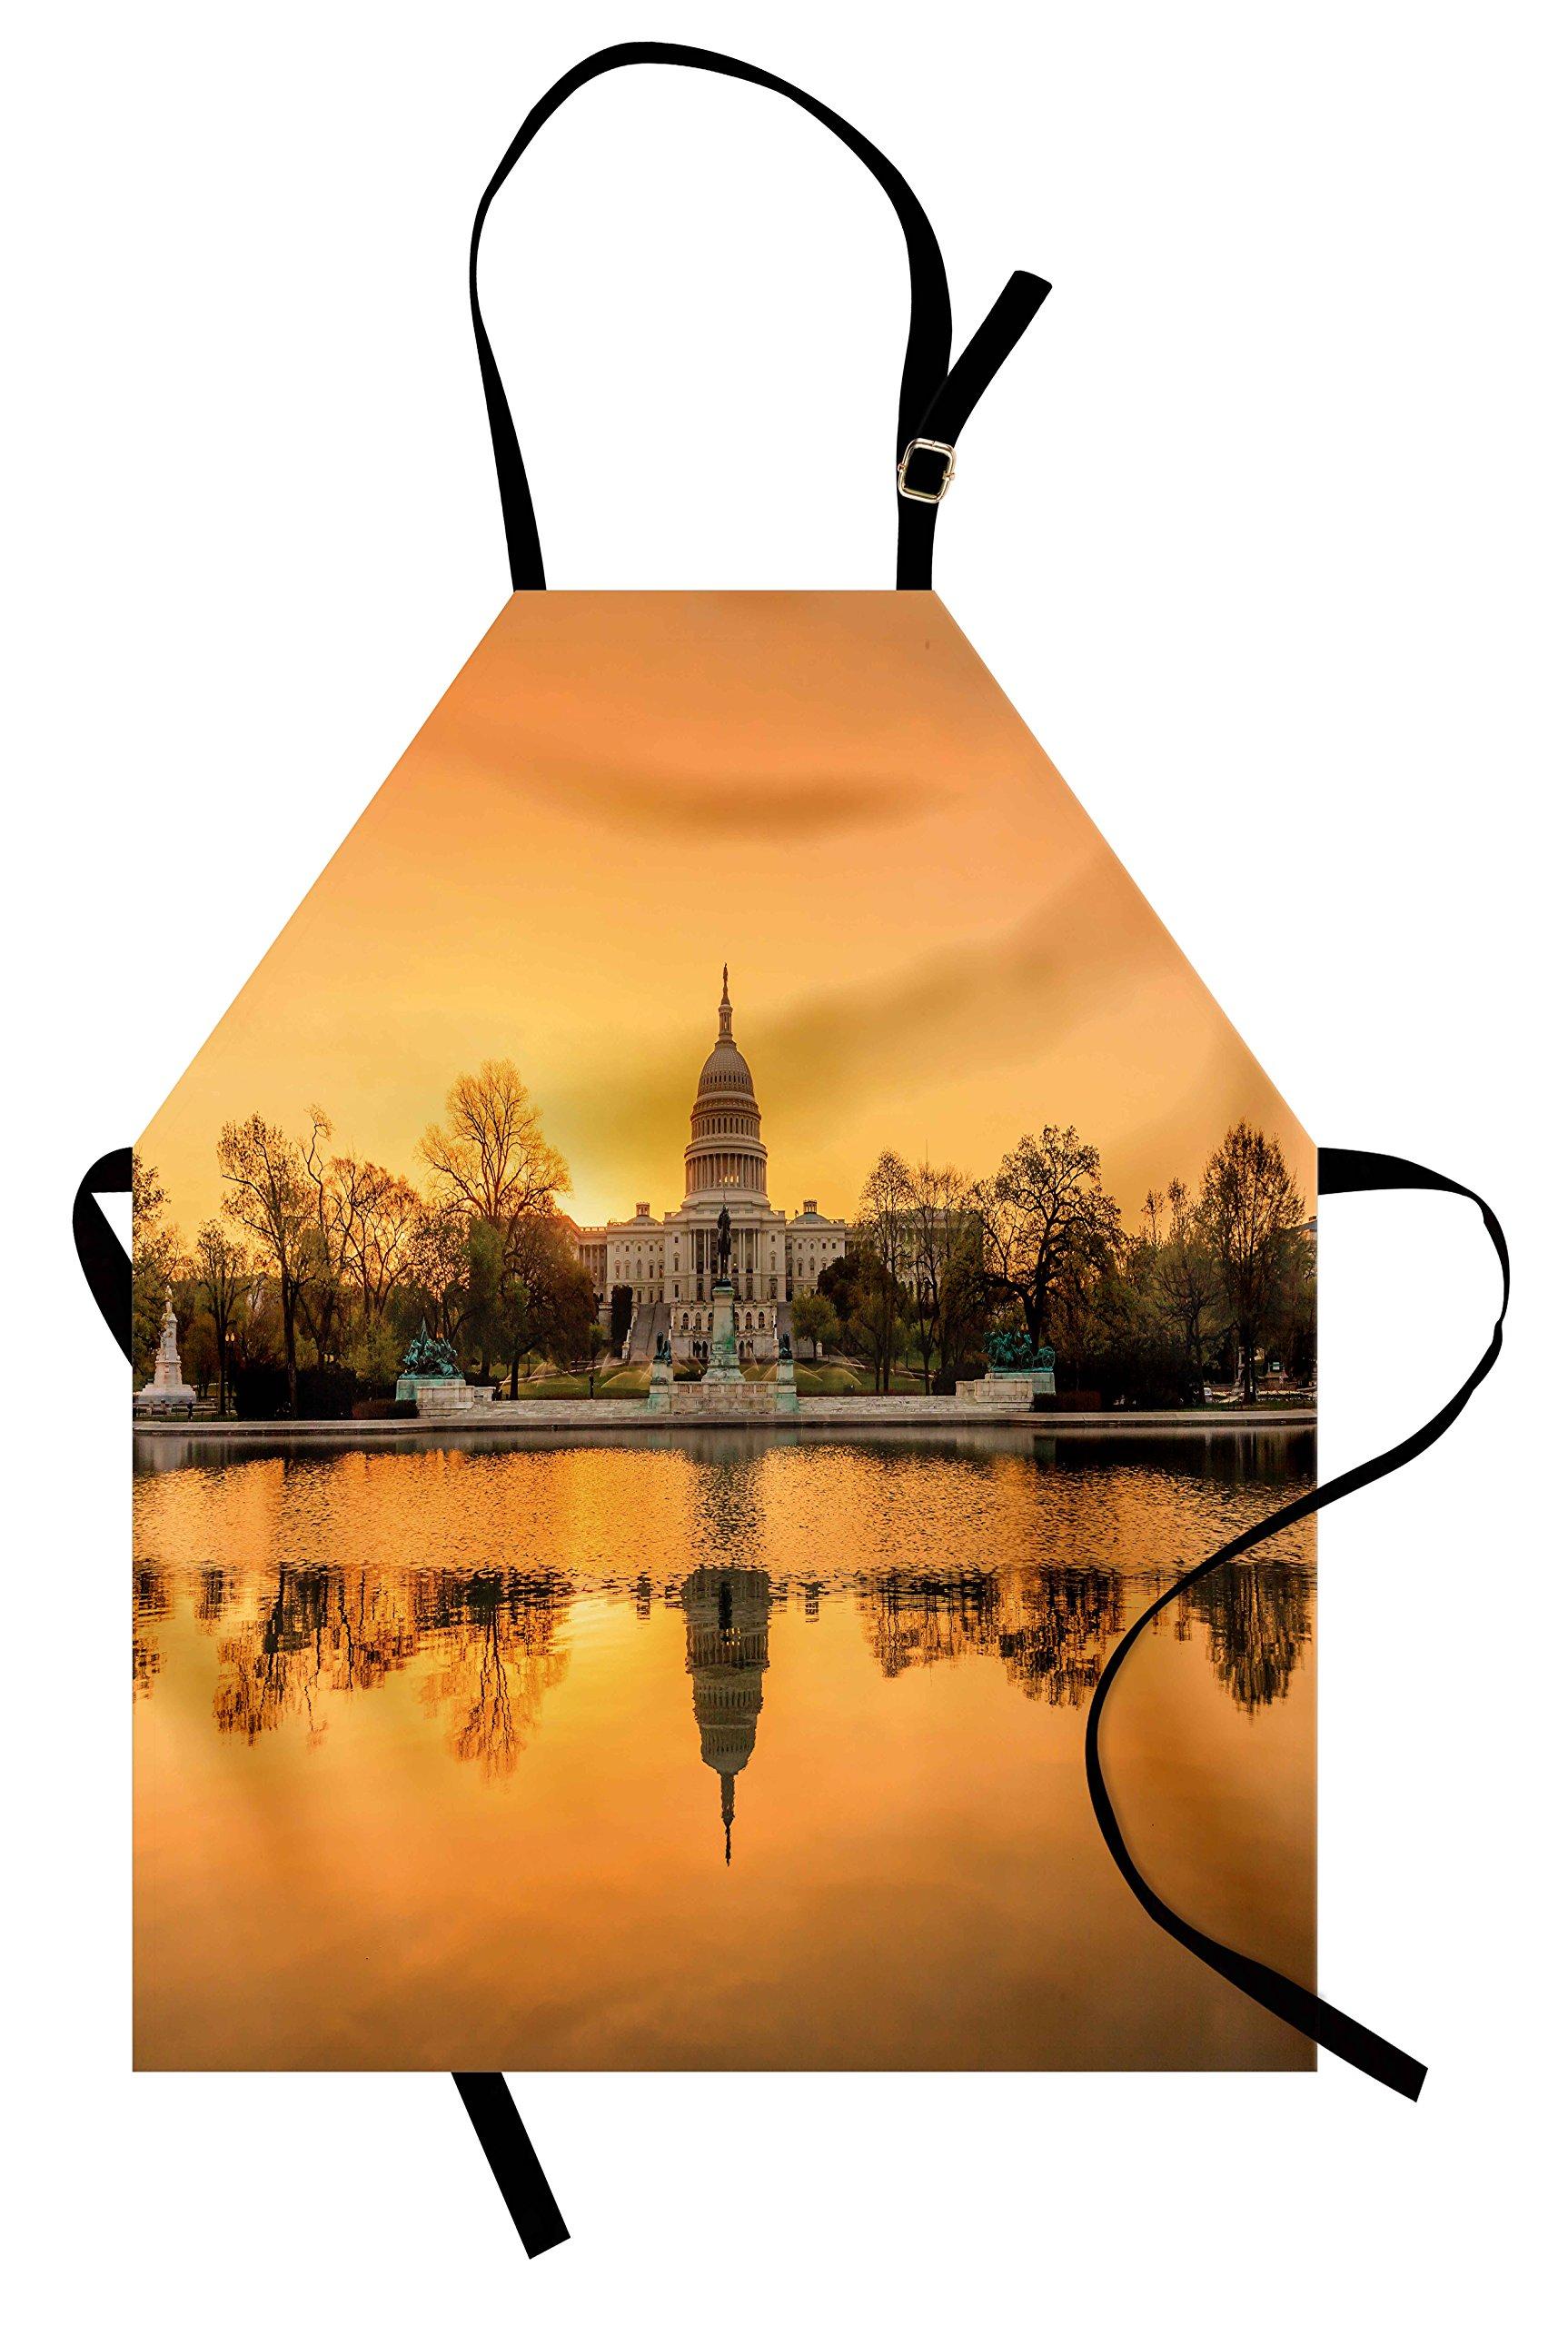 Ambesonne United States Apron, Washington DC American Capital City White House Above The Lake Landscape, Unisex Kitchen Bib Apron with Adjustable Neck for Cooking Baking Gardening, Apricot Ginger